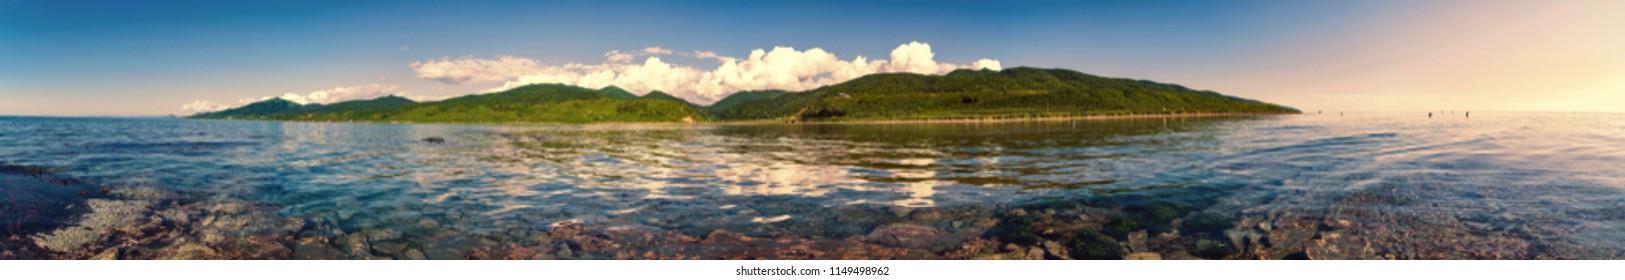 The Island Of Sakhalin. Panorama.